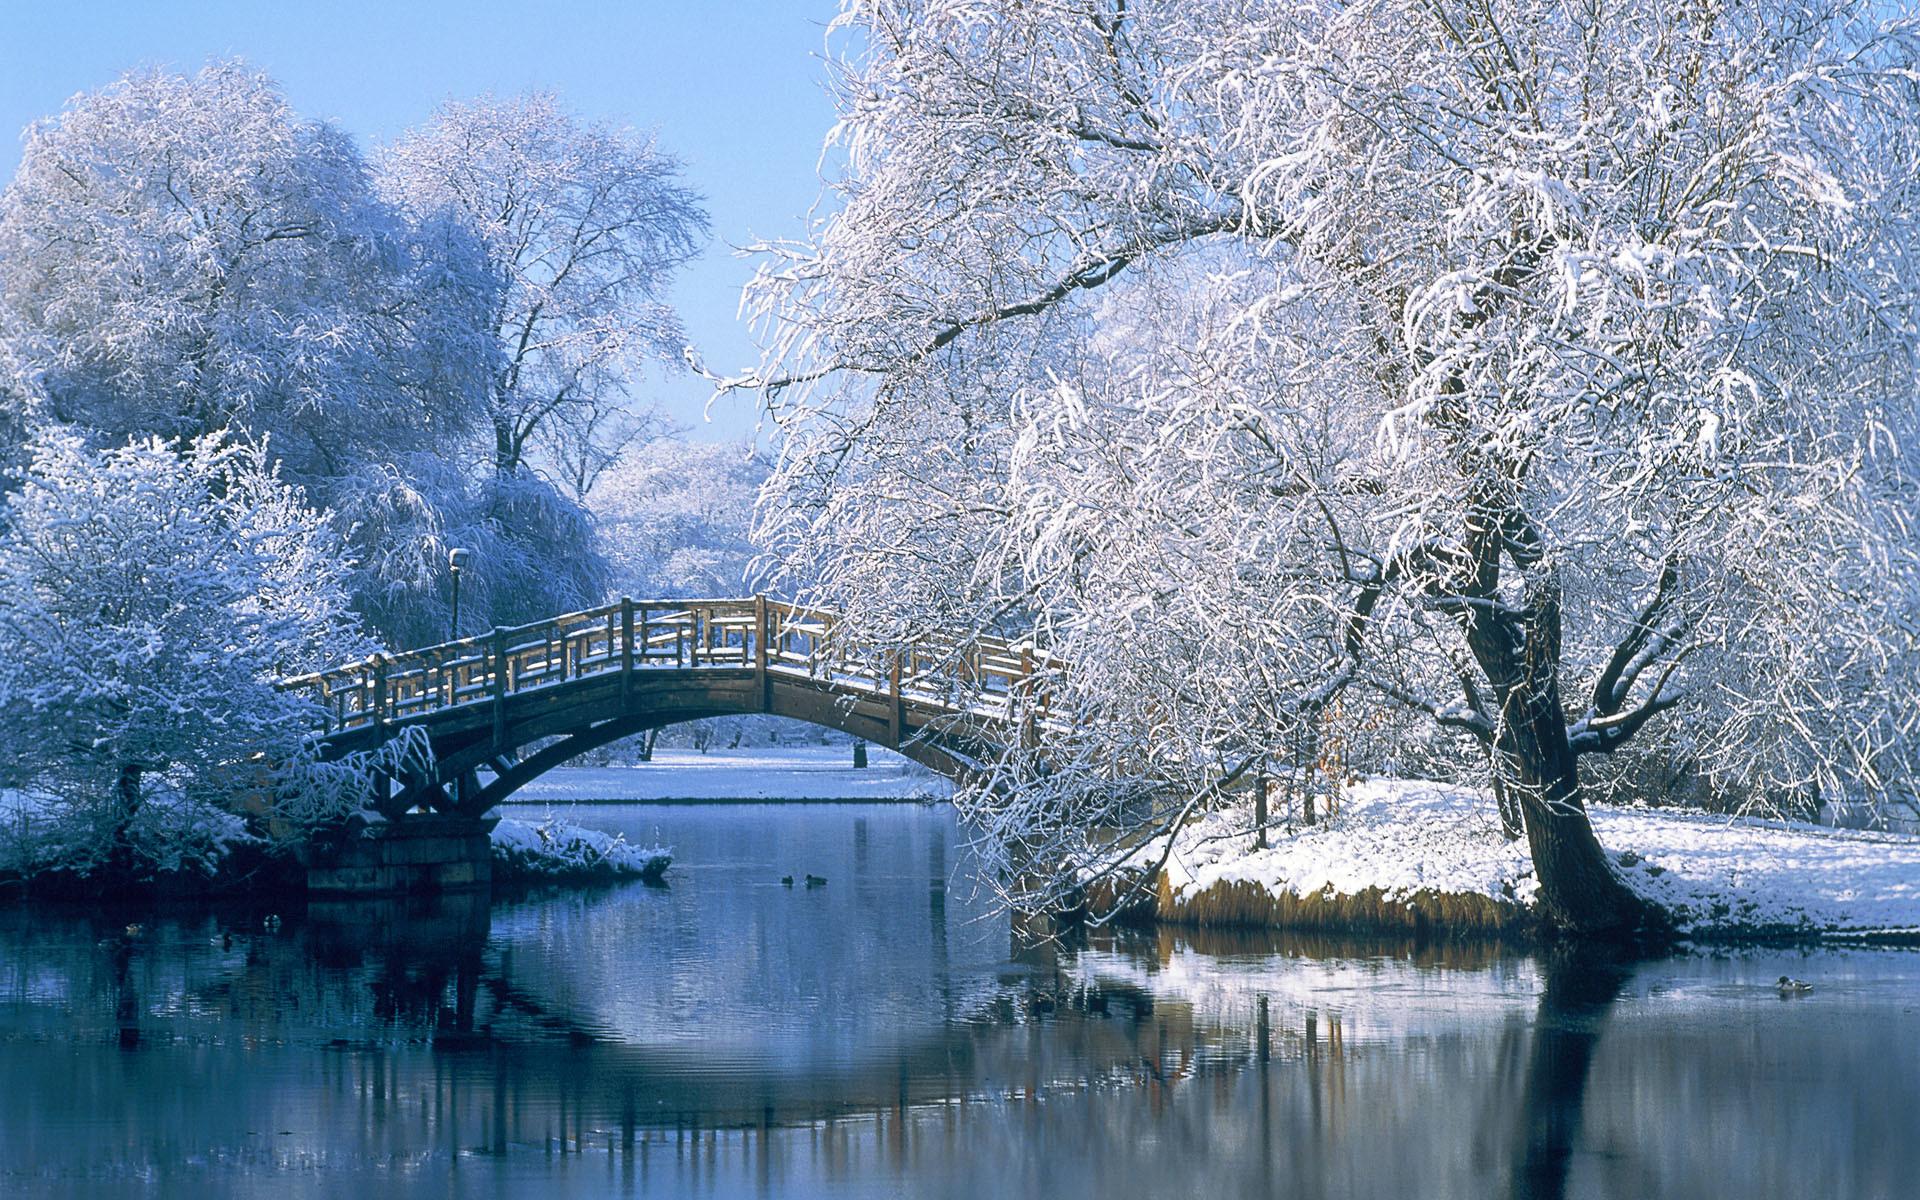 Photography – Winter Landscape Pond Water Bridge Tree Reflection Snow  Wallpaper